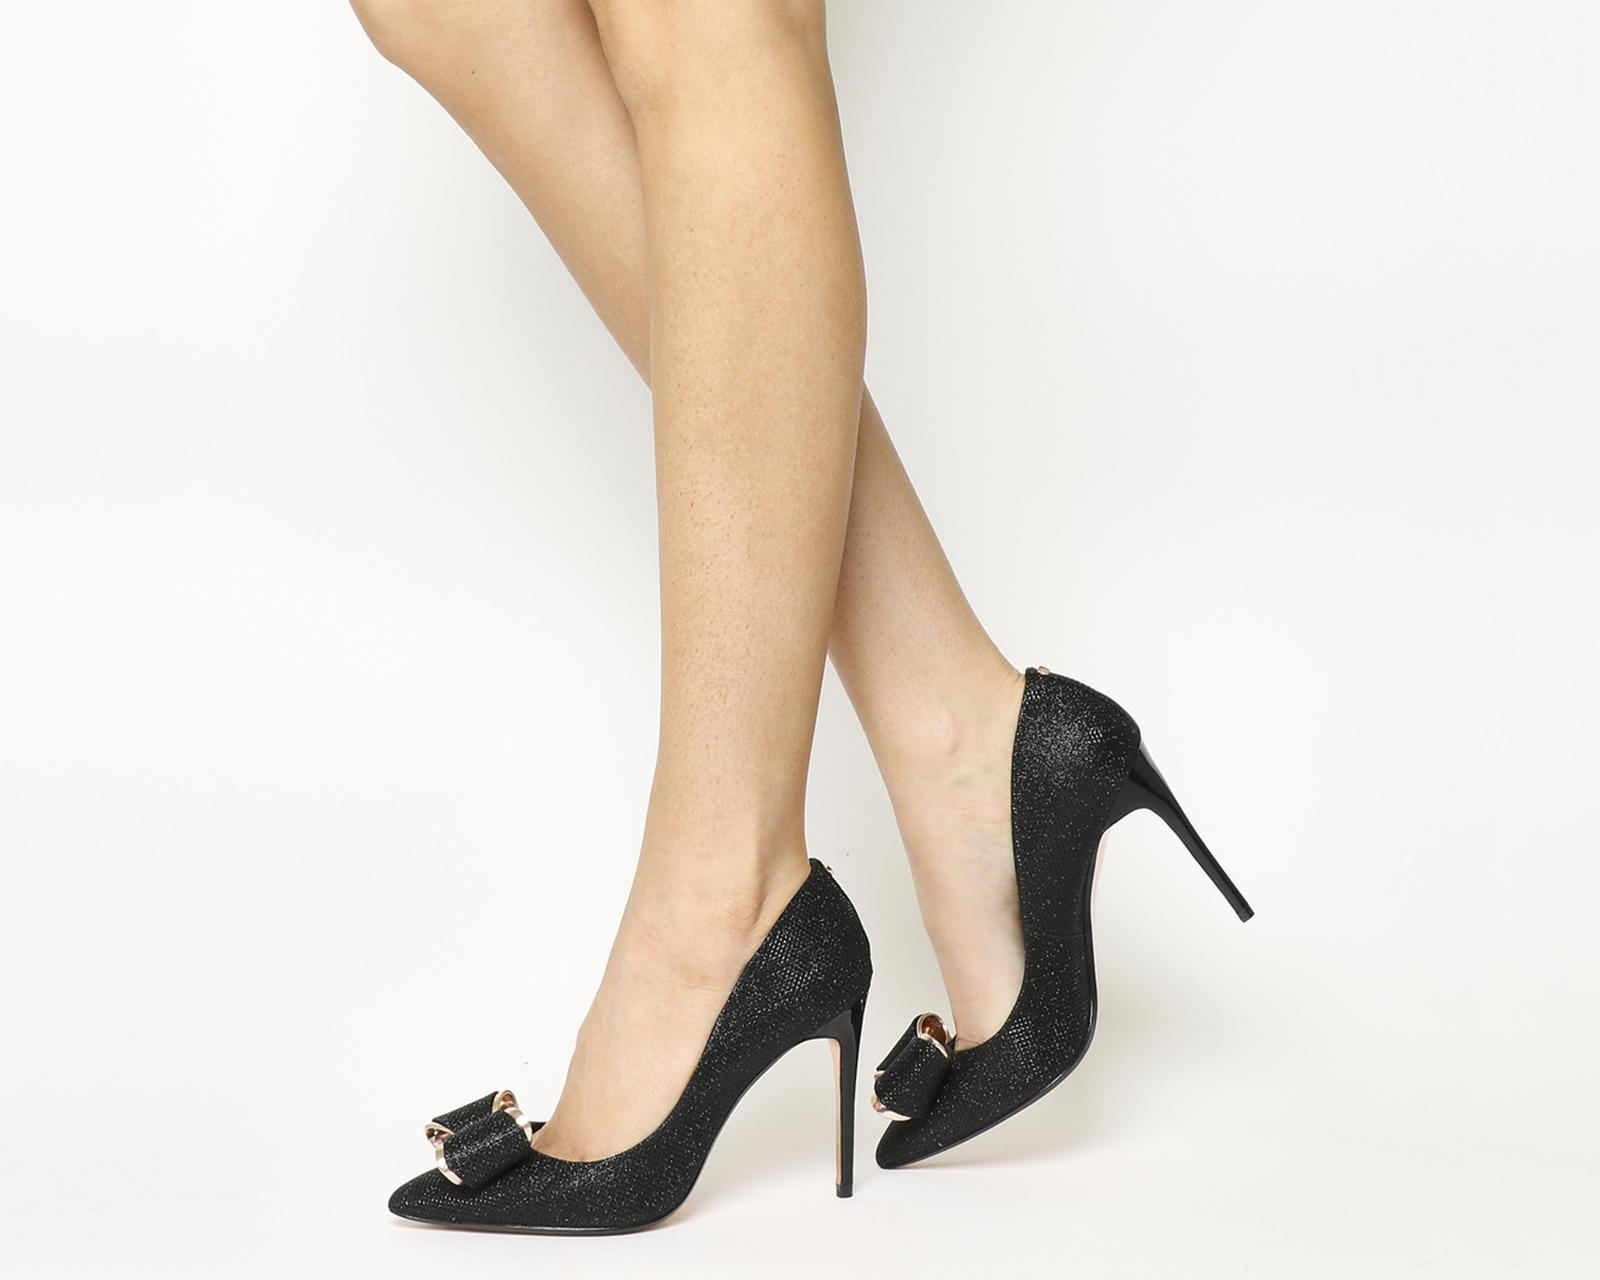 13b6472d55717 Sentinel Womens Ted Baker Azeline Heels BLACK TEXTILE Heels